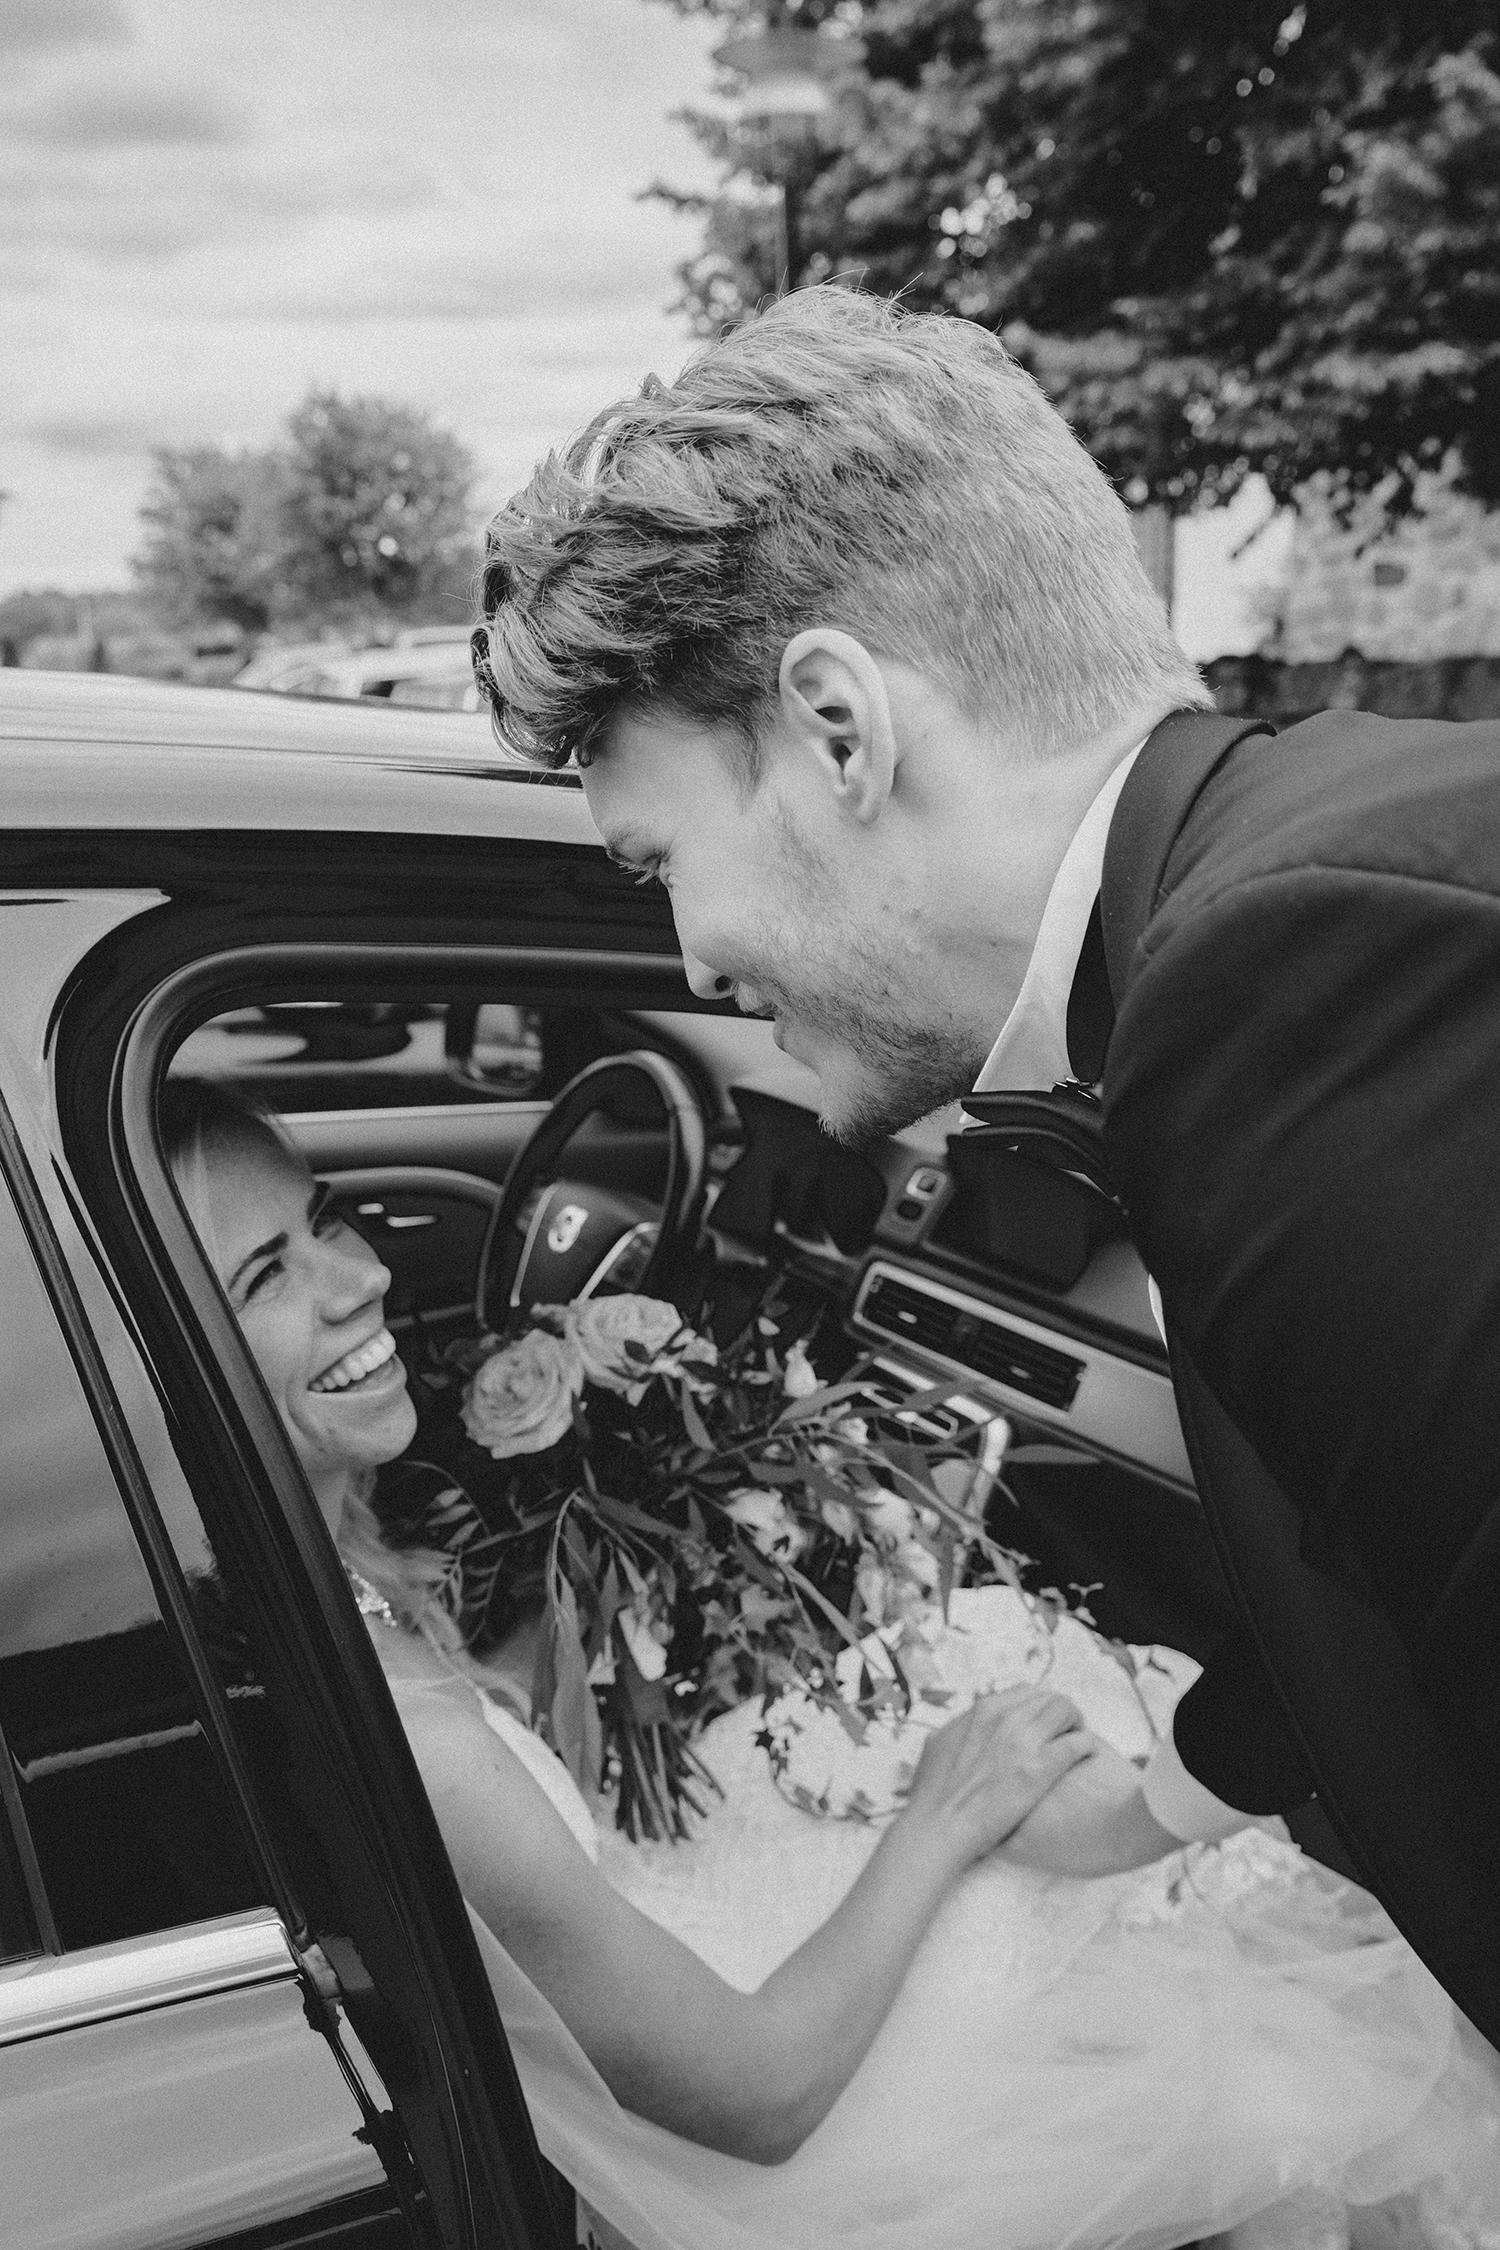 amanda_joel_2018_alicia_sjostrom_photography_34.jpg